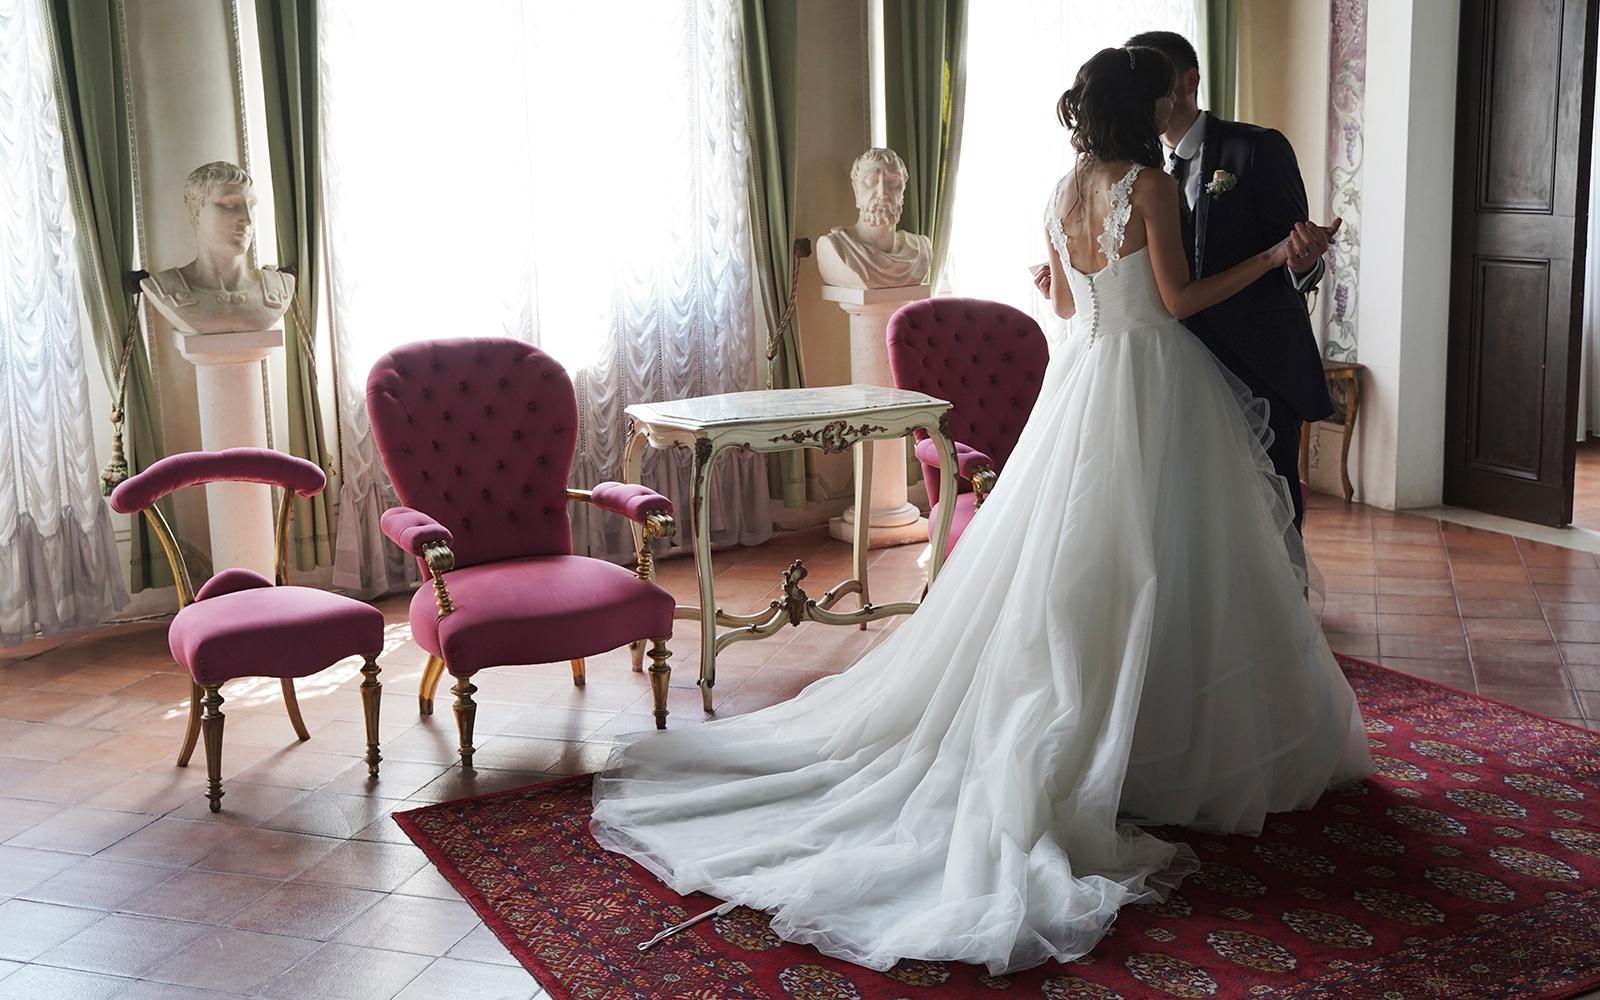 villa per eventi, villa per eventi Vicenza, villa per eventi Padova , villa per matrimoni Vicenza, villa per matrimoni Padova